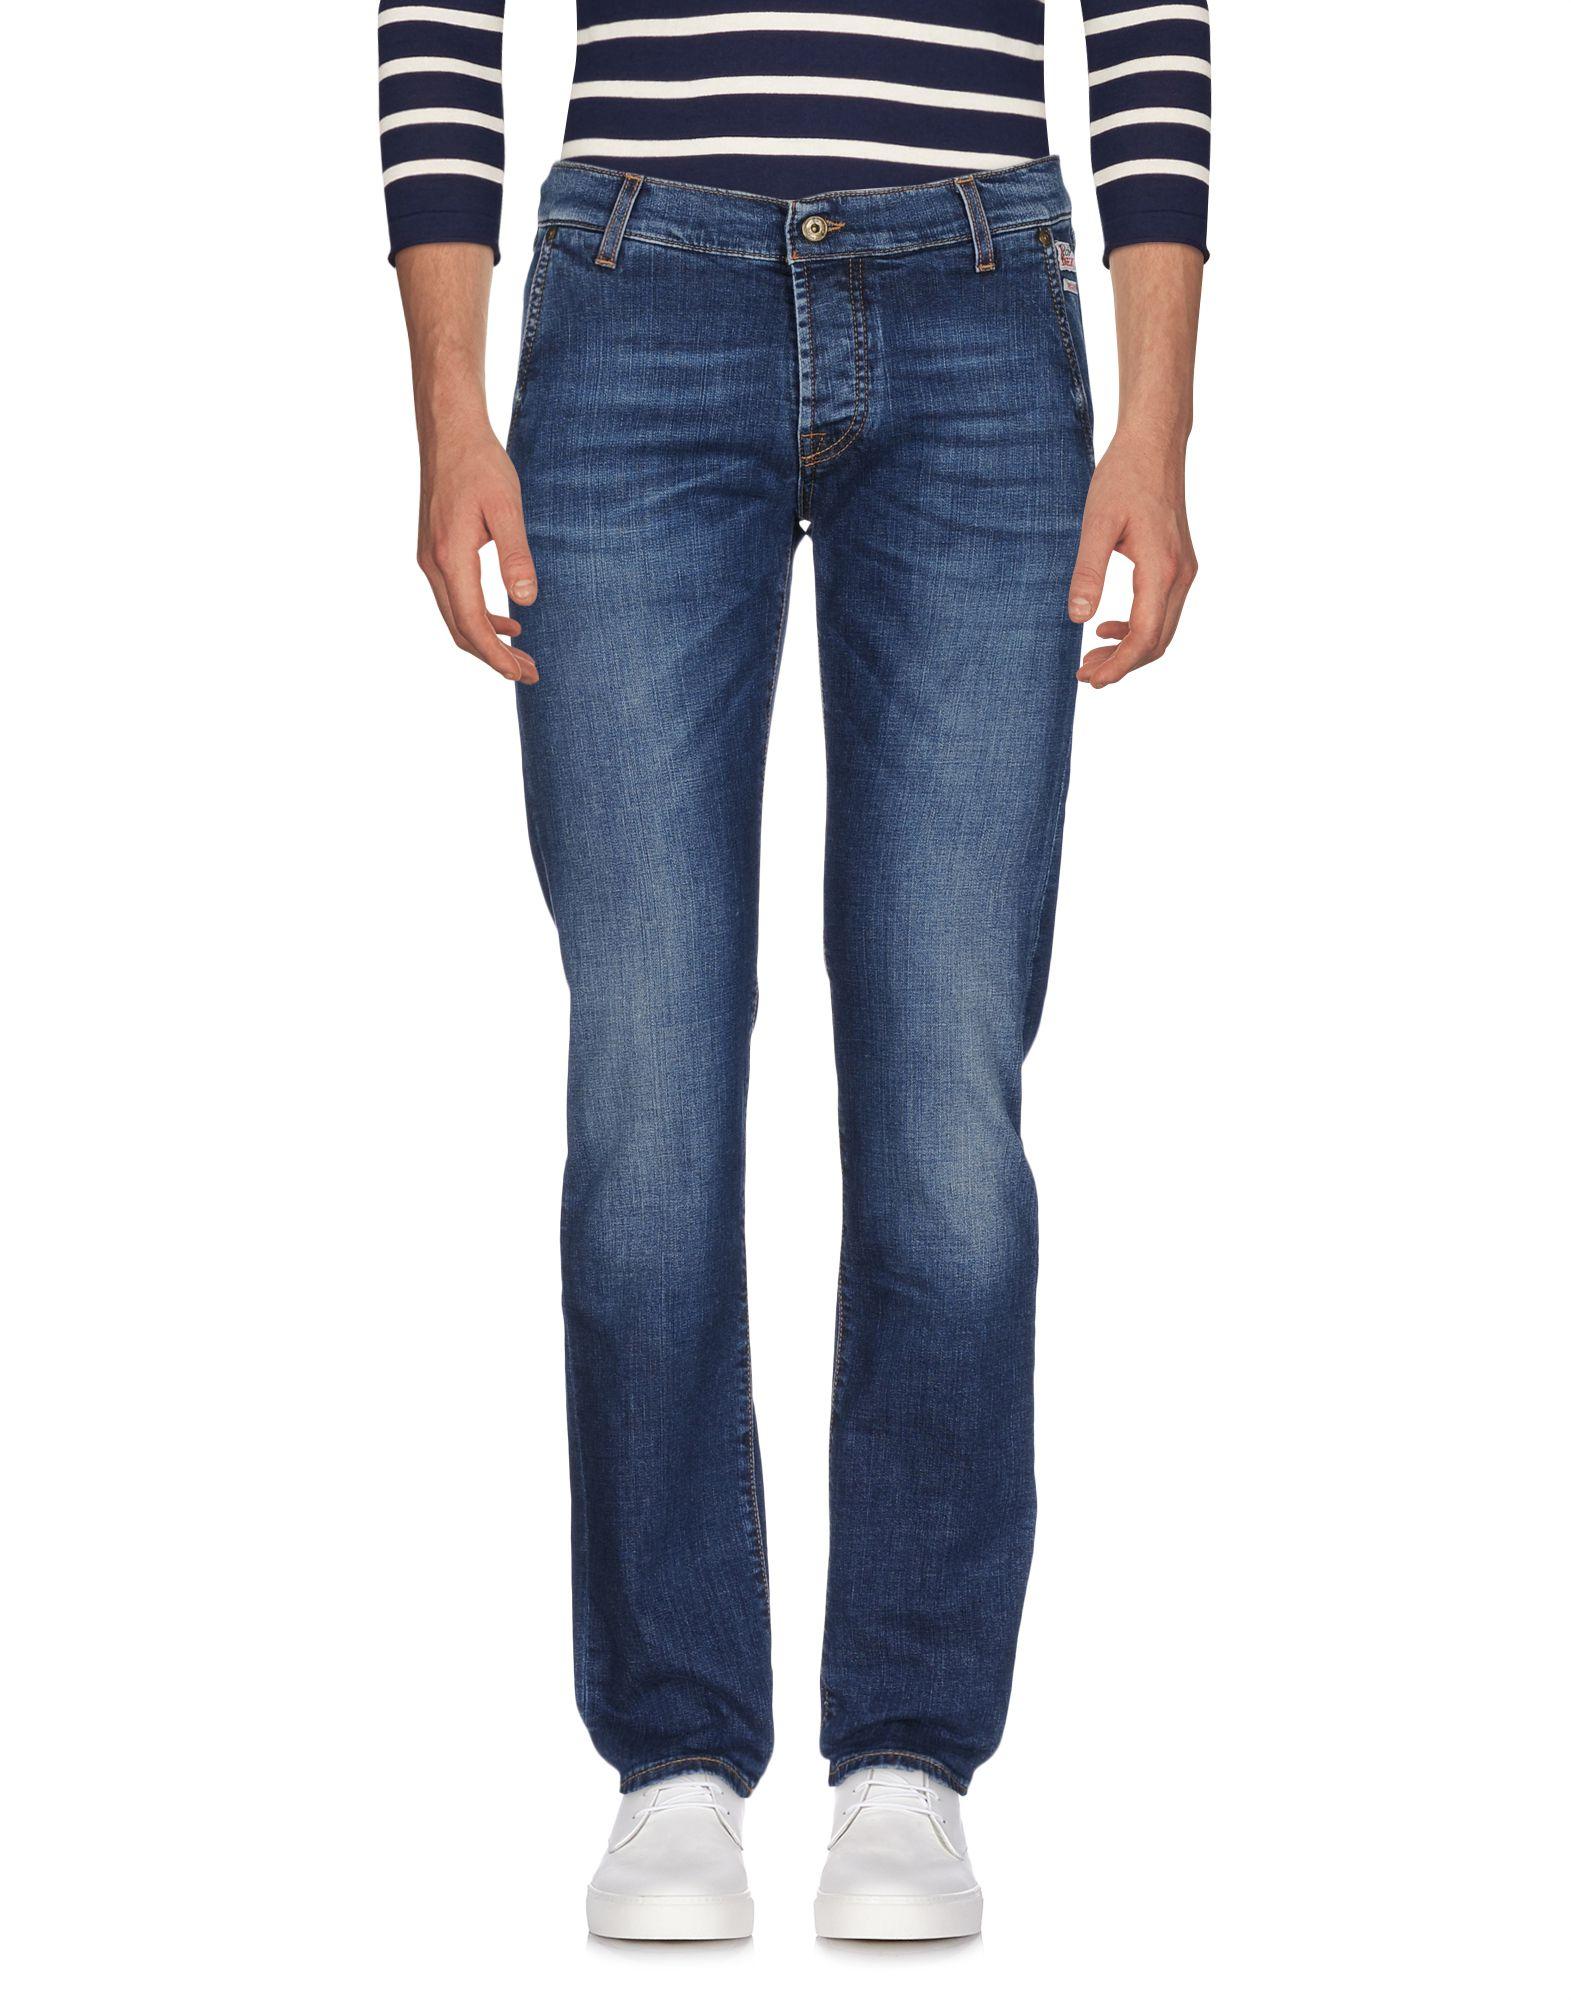 Pantaloni Jeans Roÿ Rogers Donna - Acquista online su